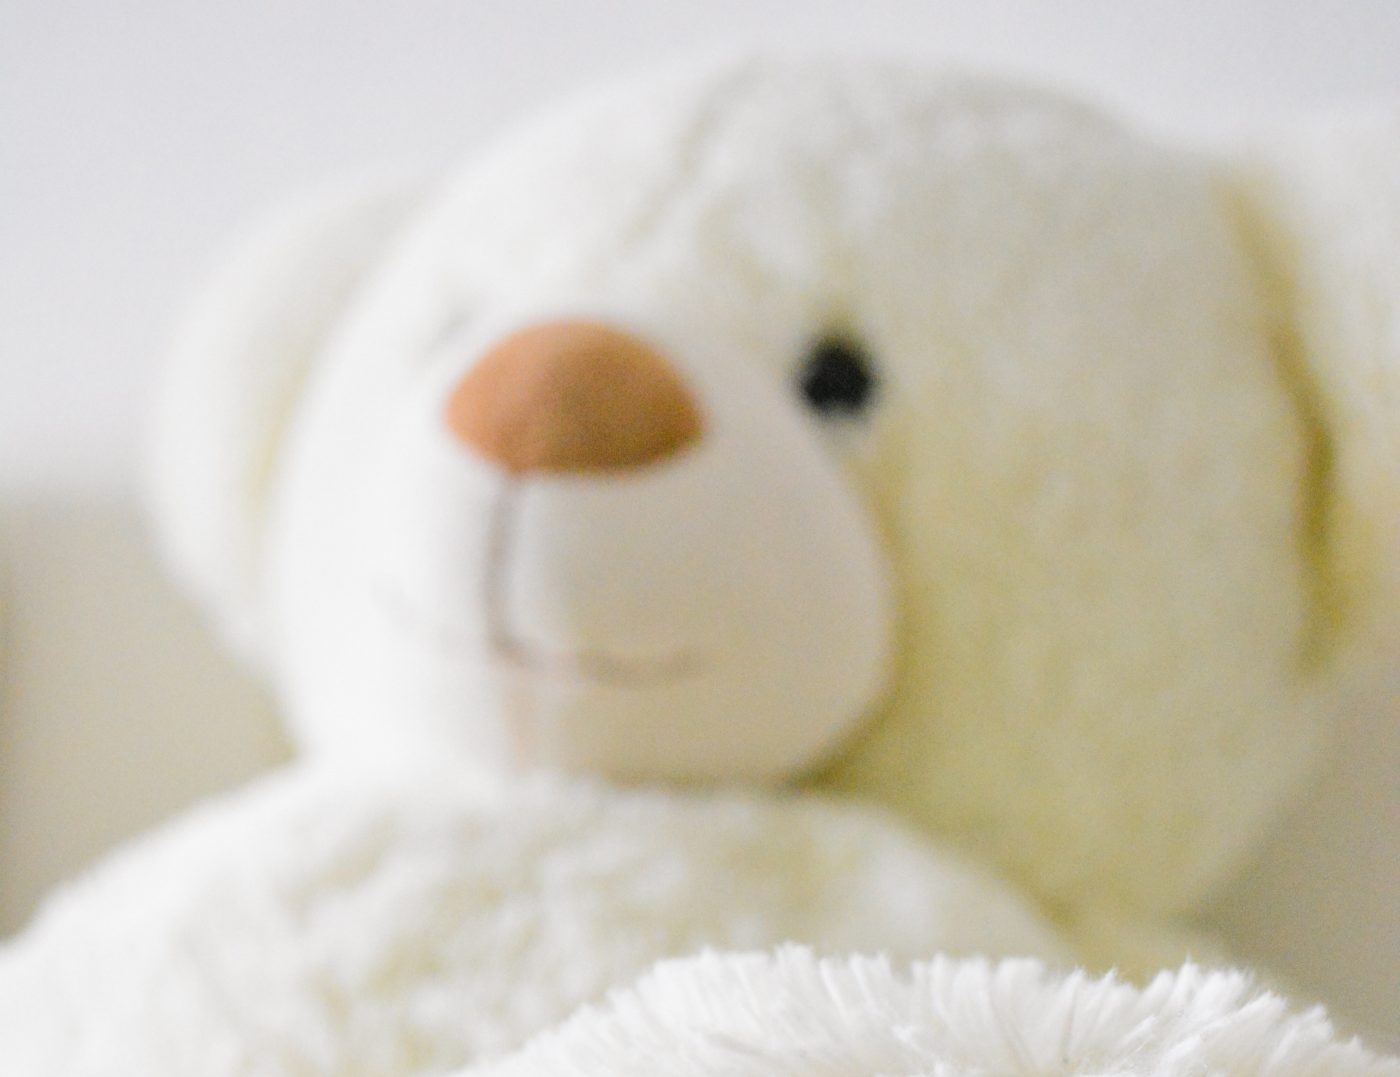 bear-close-up-cuddle-754178 final short